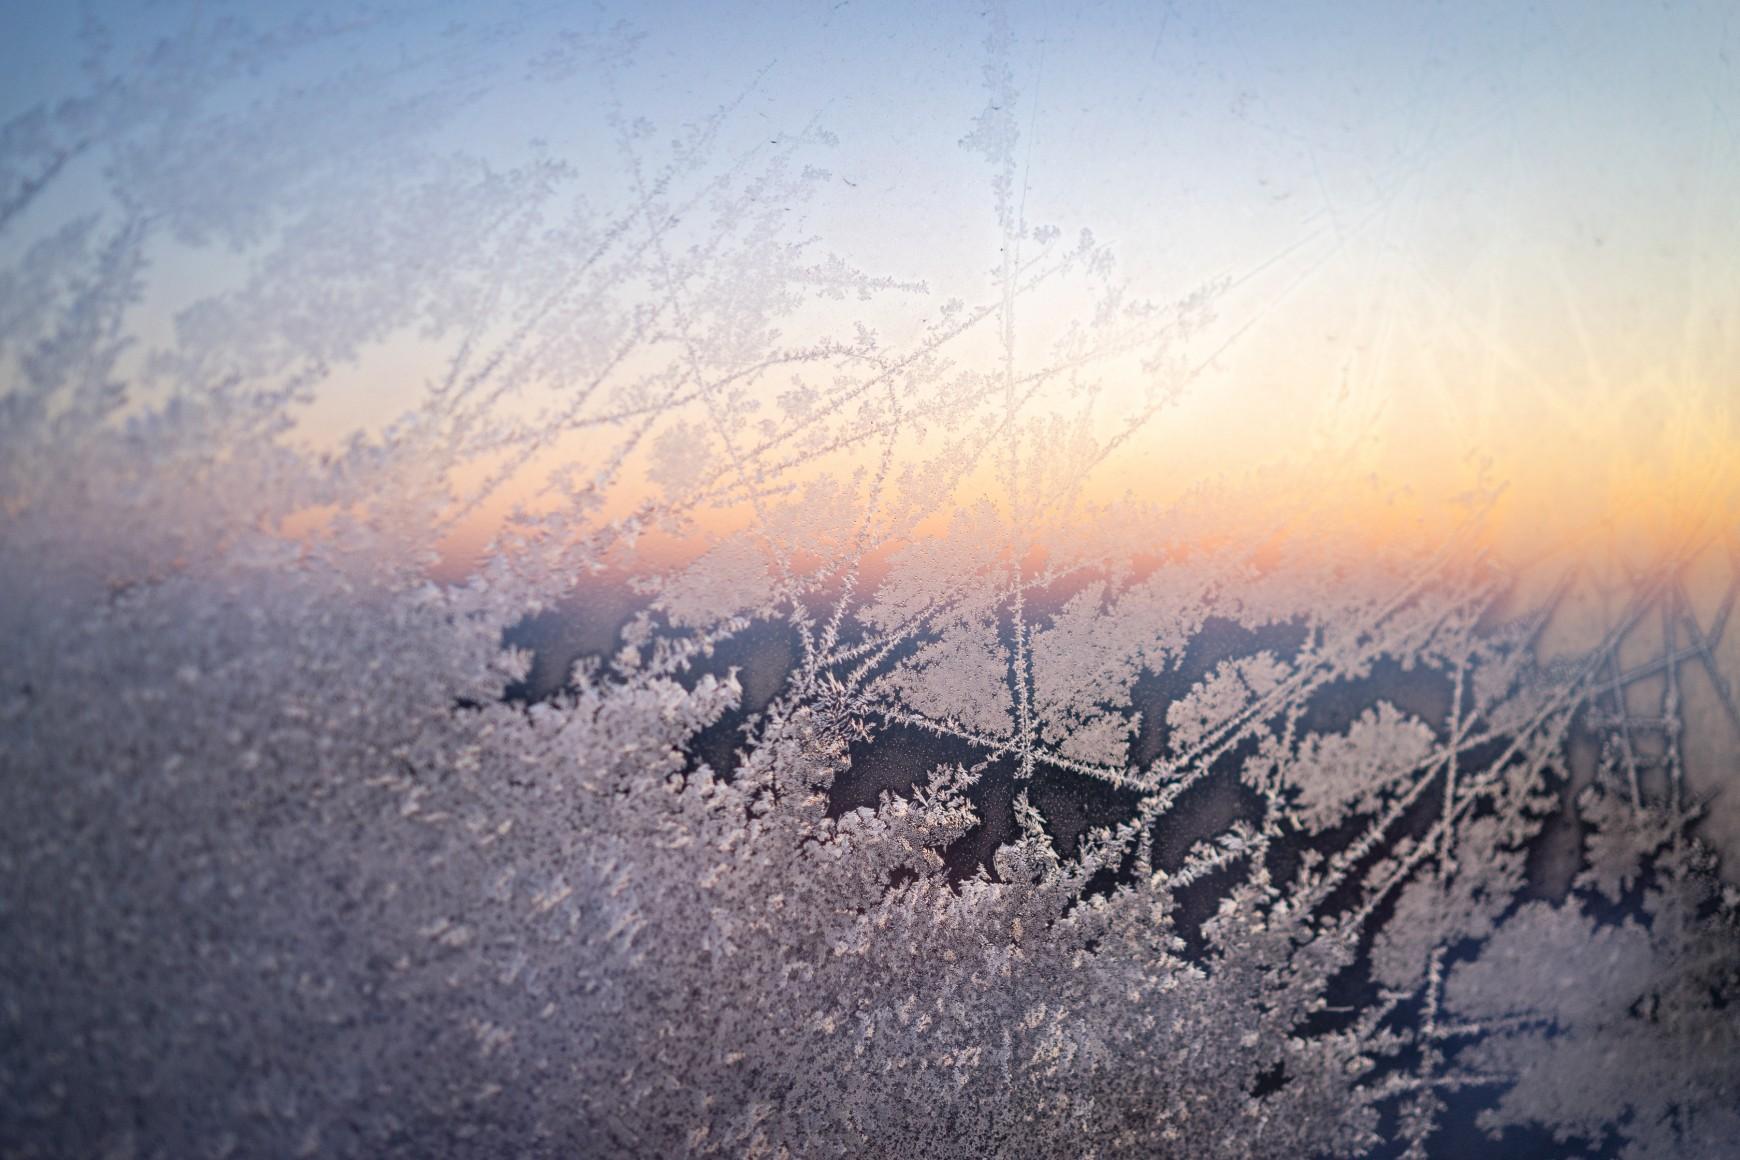 Morgensonne im Winter